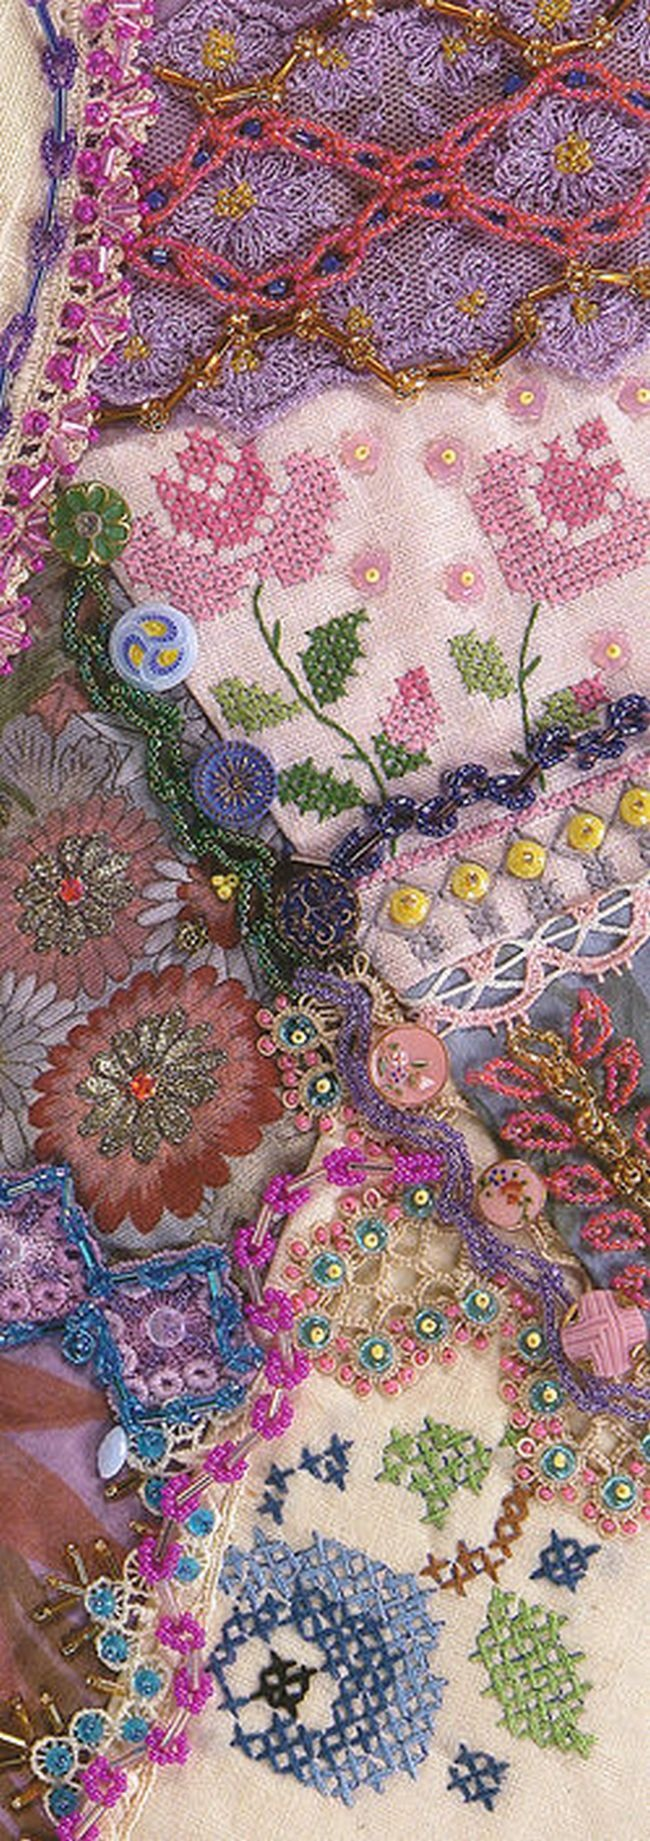 Crazy Quilting Stitches Patterns : 17+ best ideas about Crazy Quilting on Pinterest Crazy patchwork, Crazy quilt stitches and ...